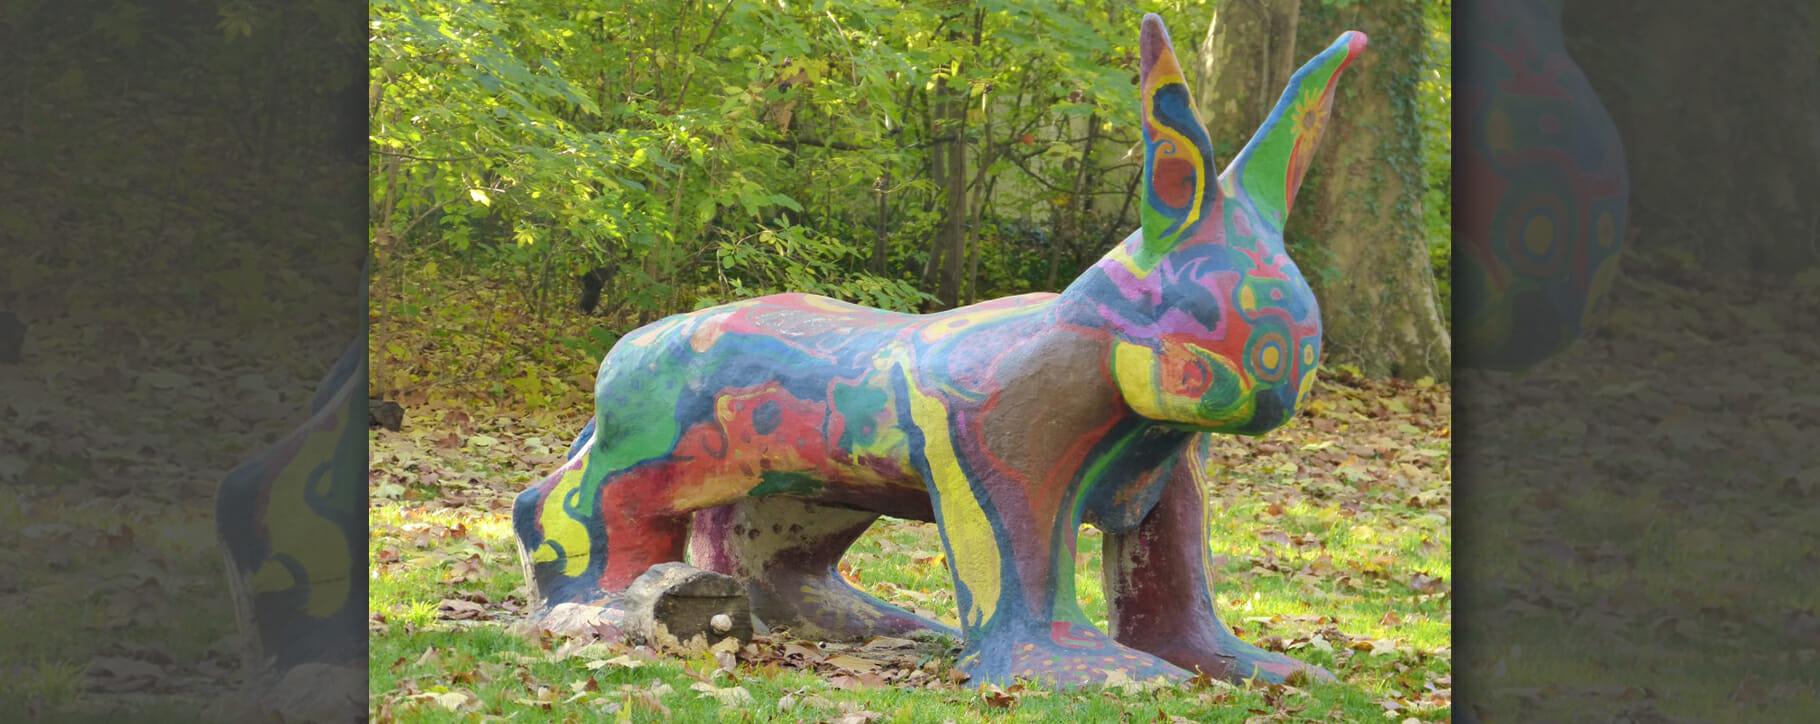 Colourful Garden Statue